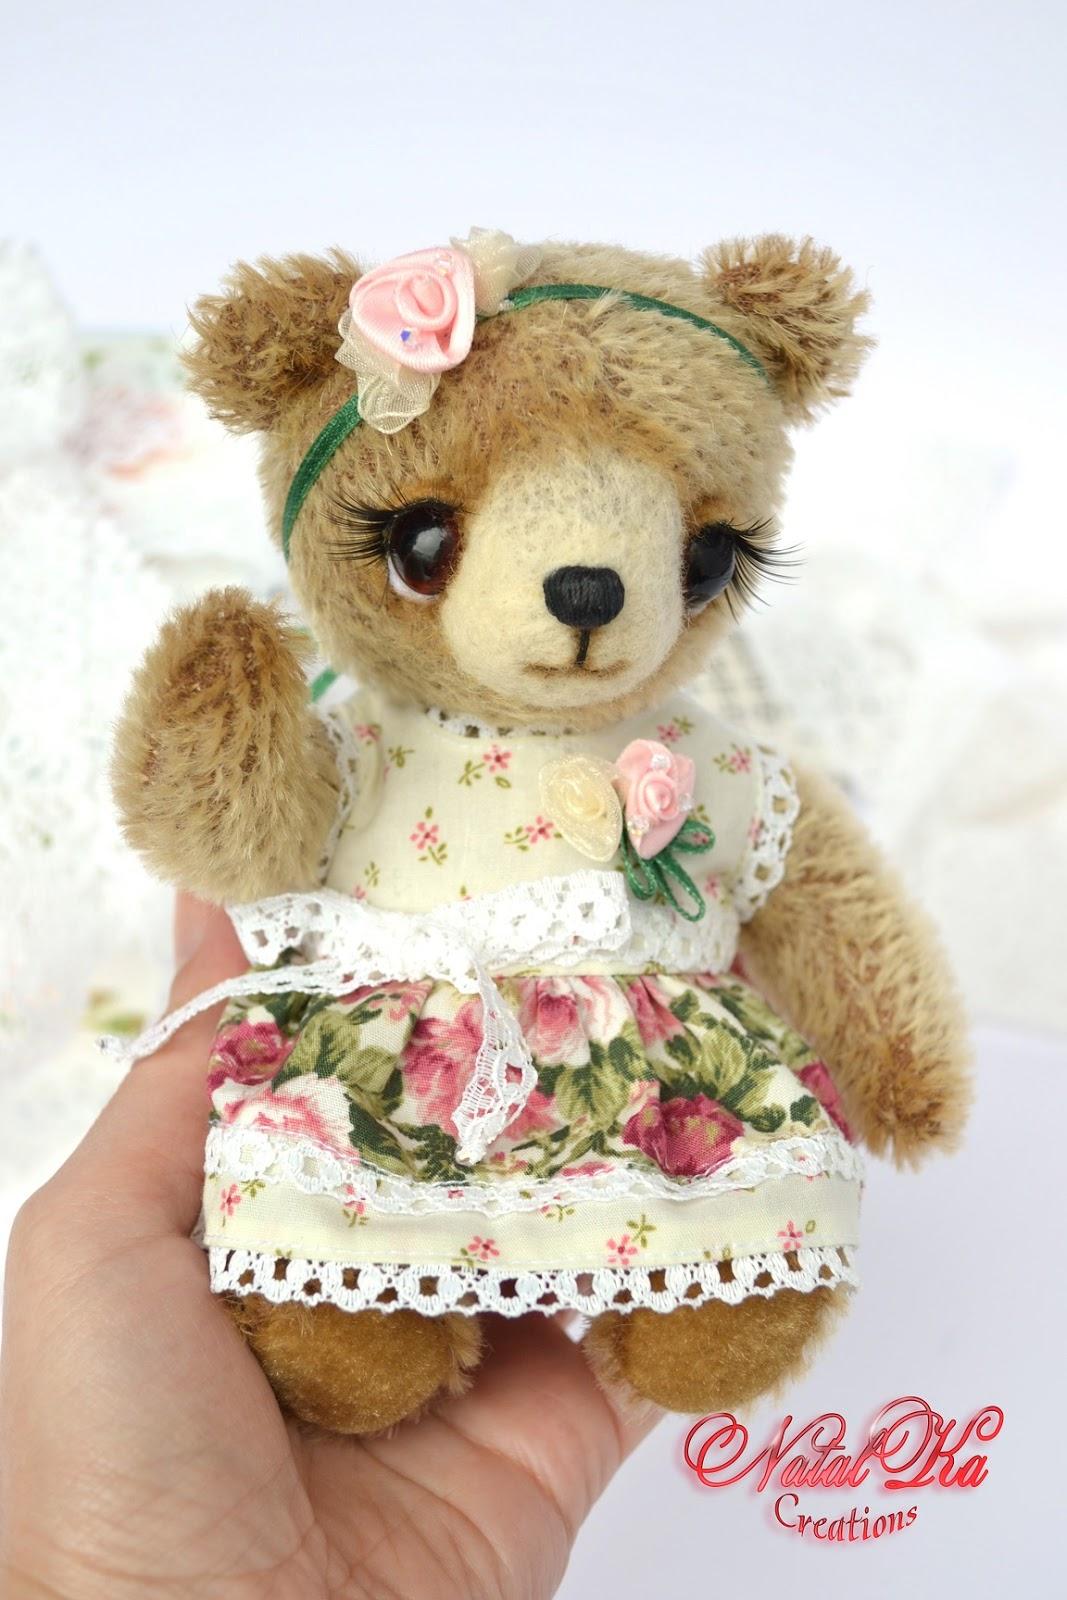 Künstlerbär aus Mohair handgemacht von NatalKa Creations. Artist teddy bear from mohair handmade by NatalKa Creations.